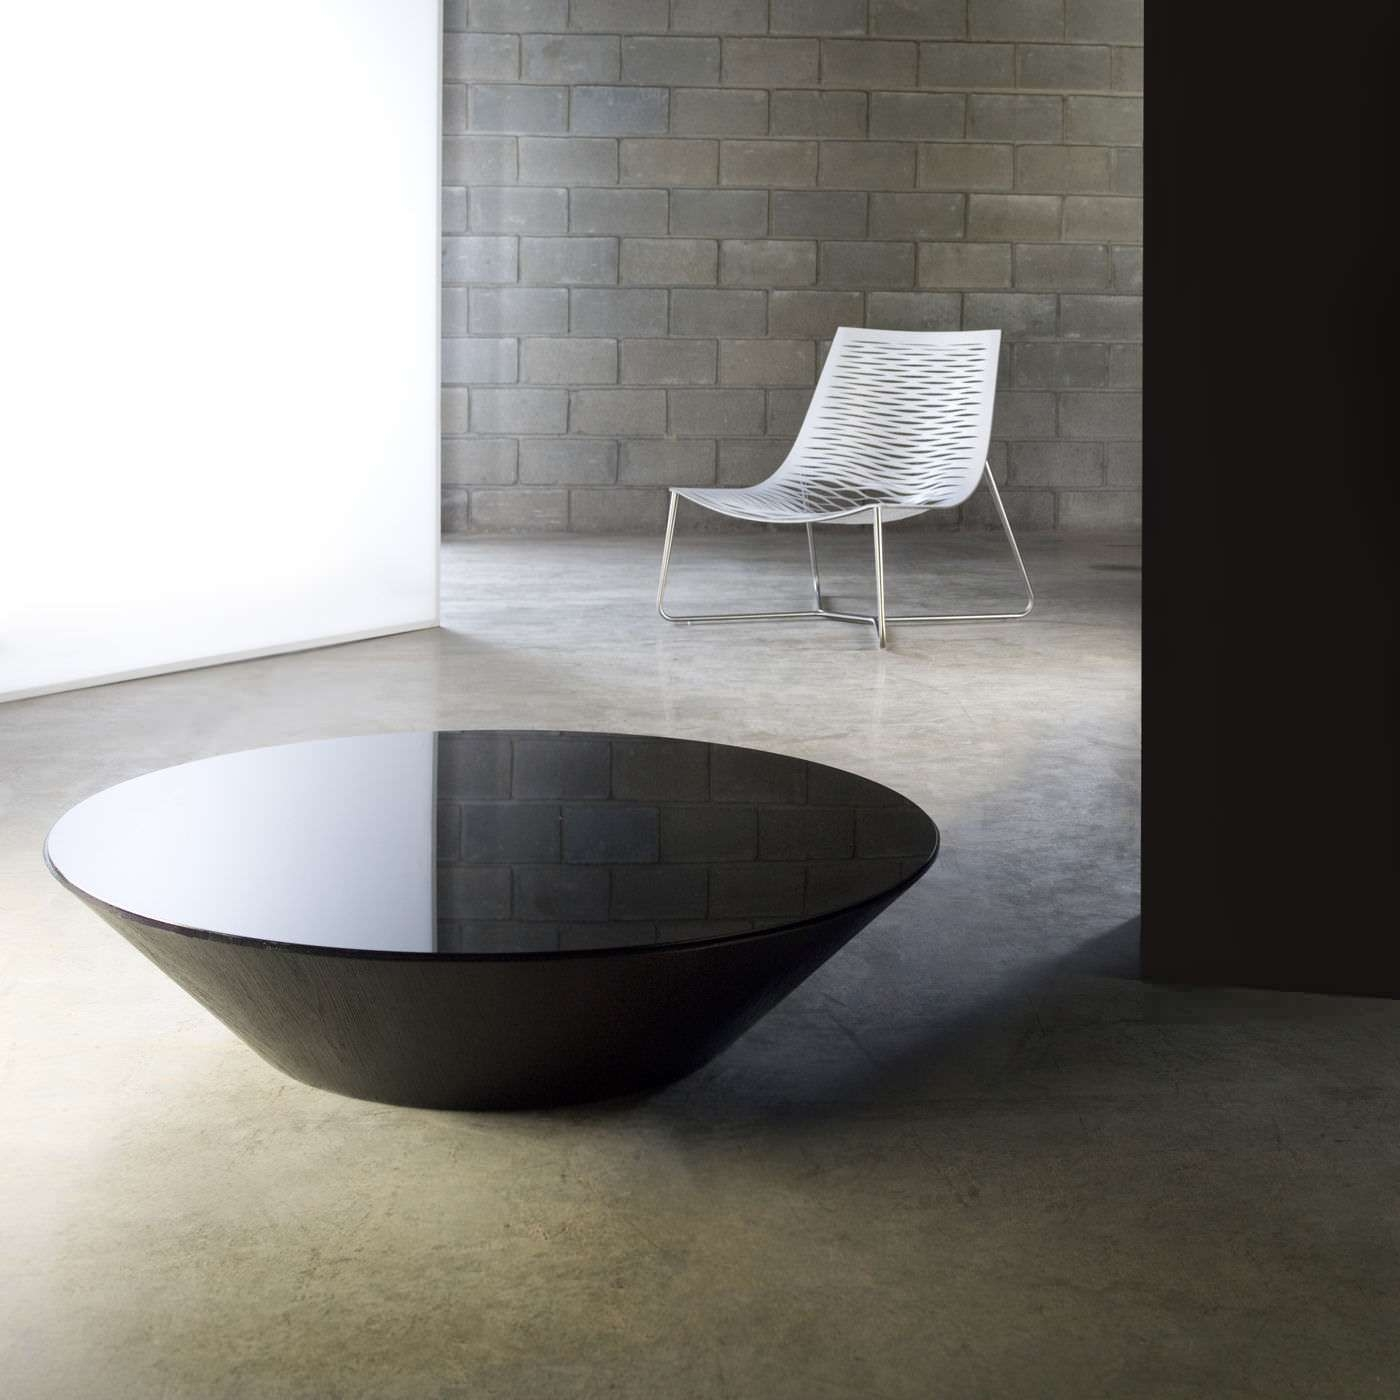 Popular Contemporary Coffee Table Regarding Contemporary Coffee Table / Glass / Round – Dorset – Modloft (View 6 of 20)